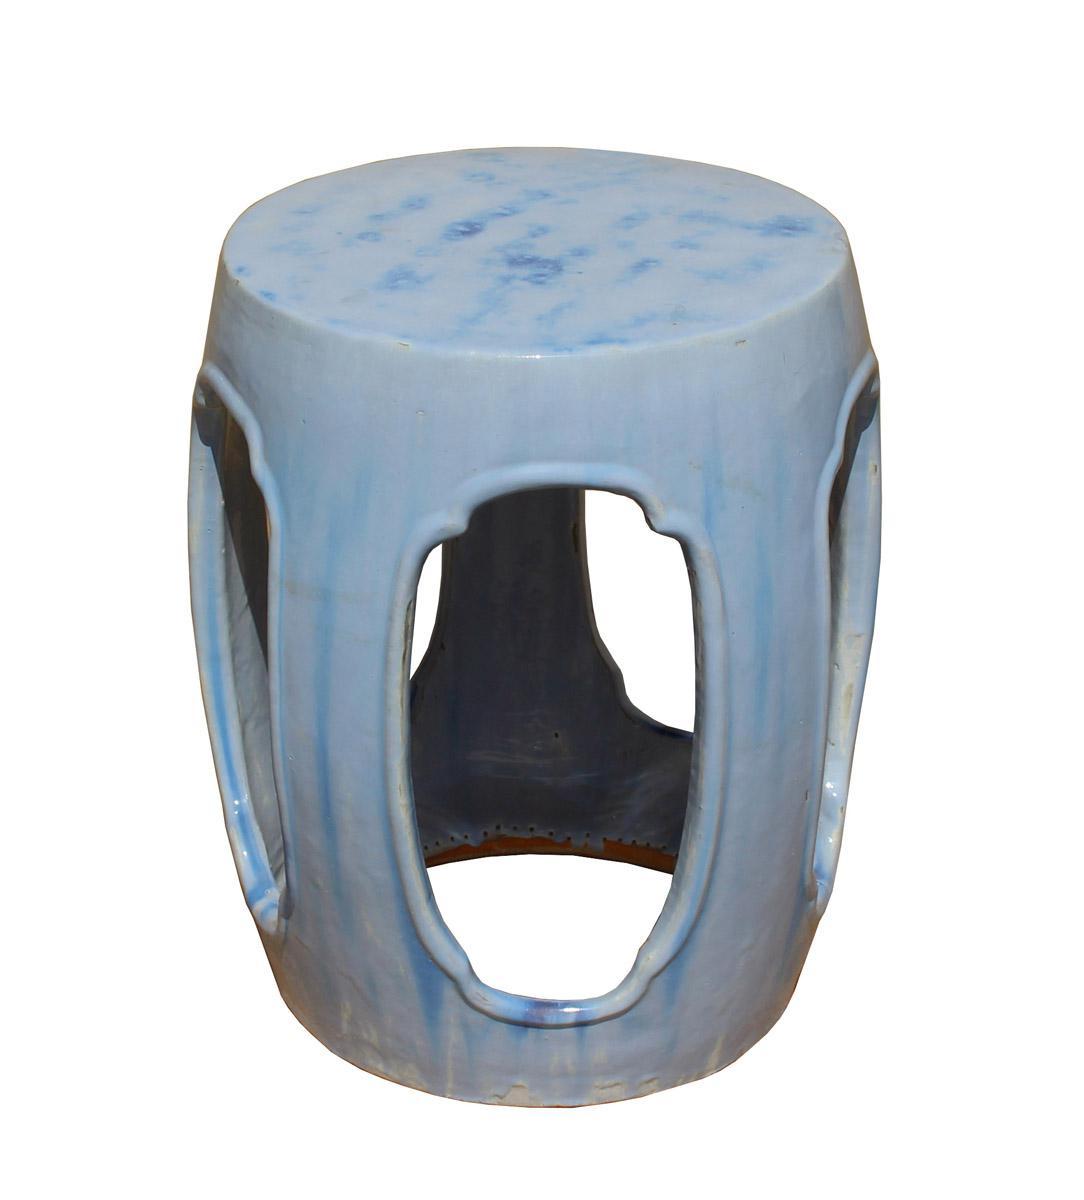 Chinese Round Barrel Light Blue Ceramic Clay Garden Stool Chairish